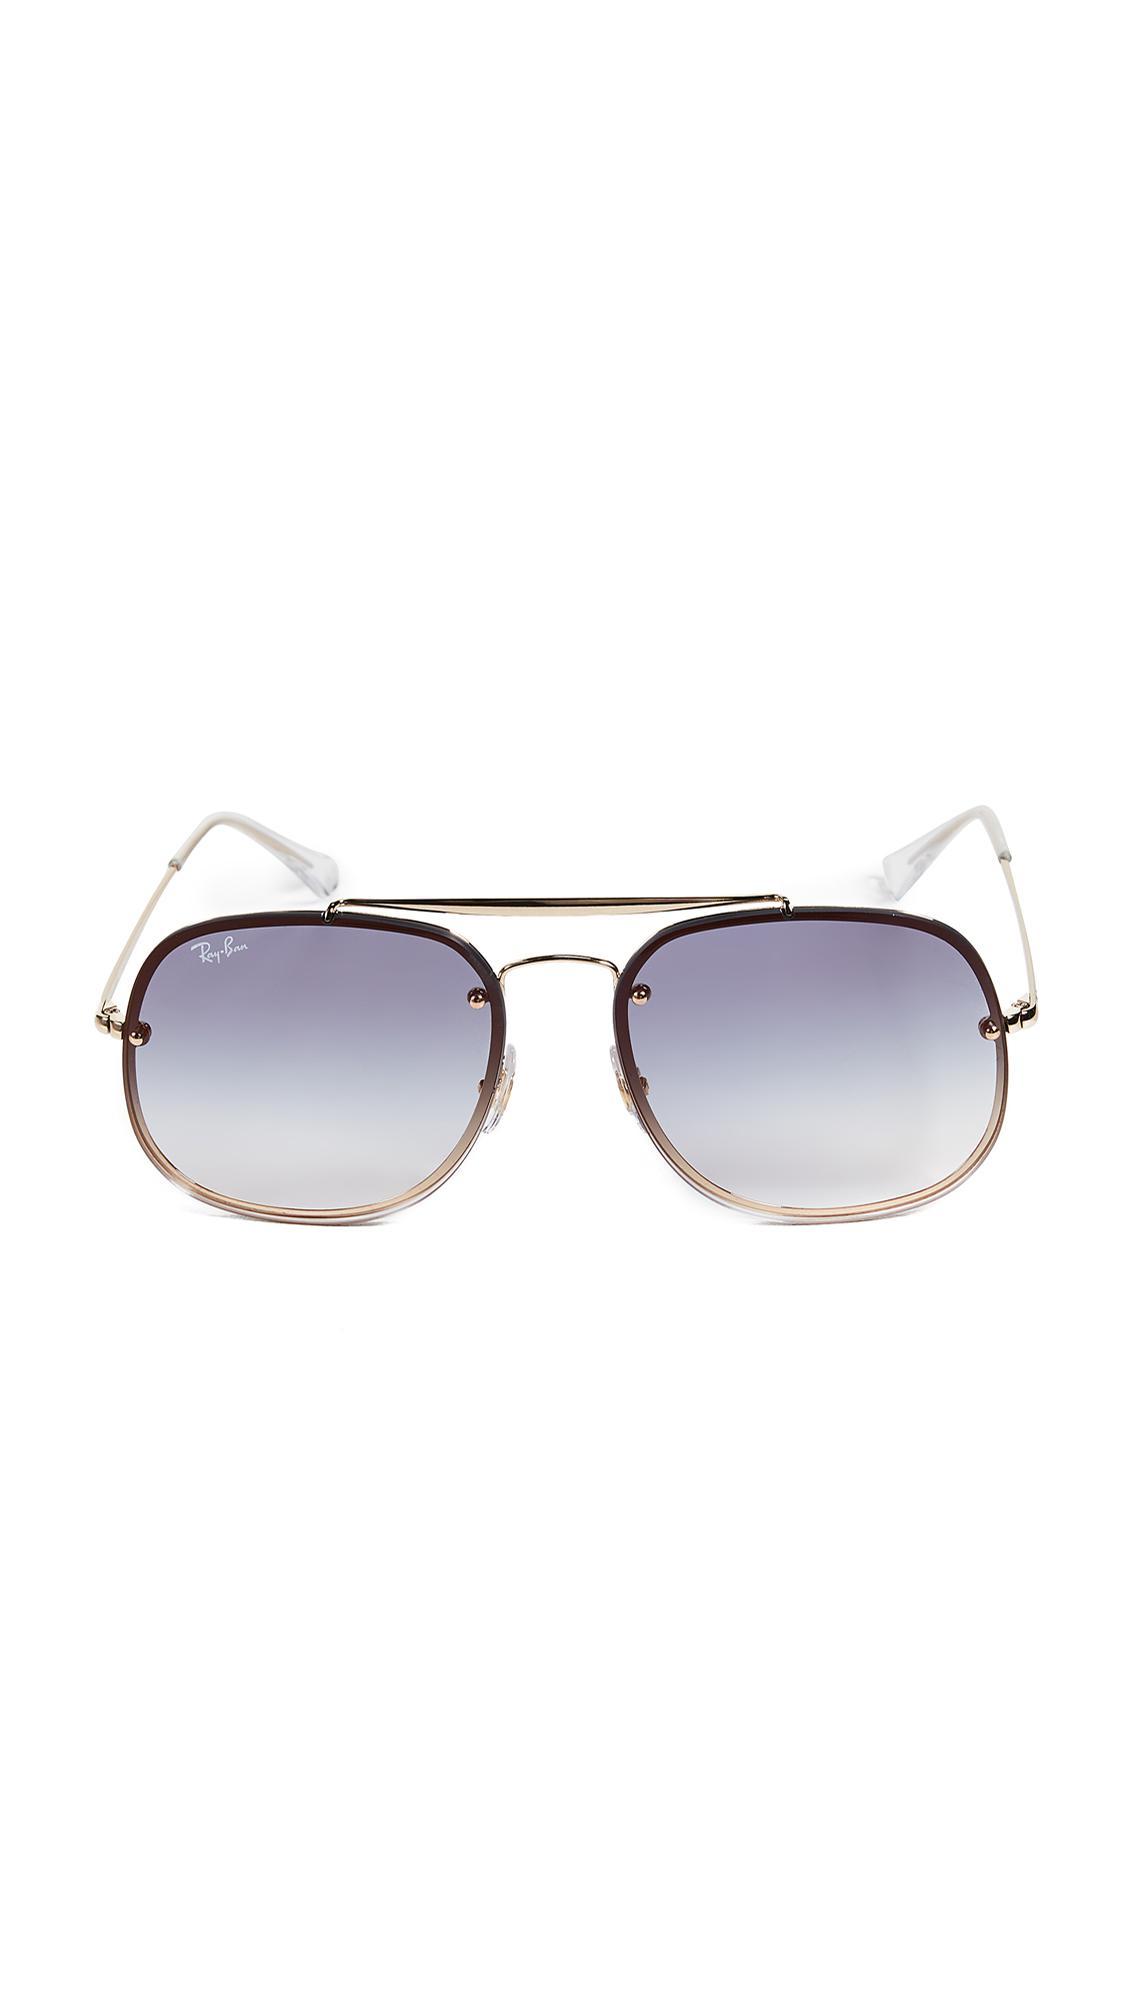 9027c3df6c Ray-Ban - Multicolor Blaze General Sunglasses for Men - Lyst. View  fullscreen